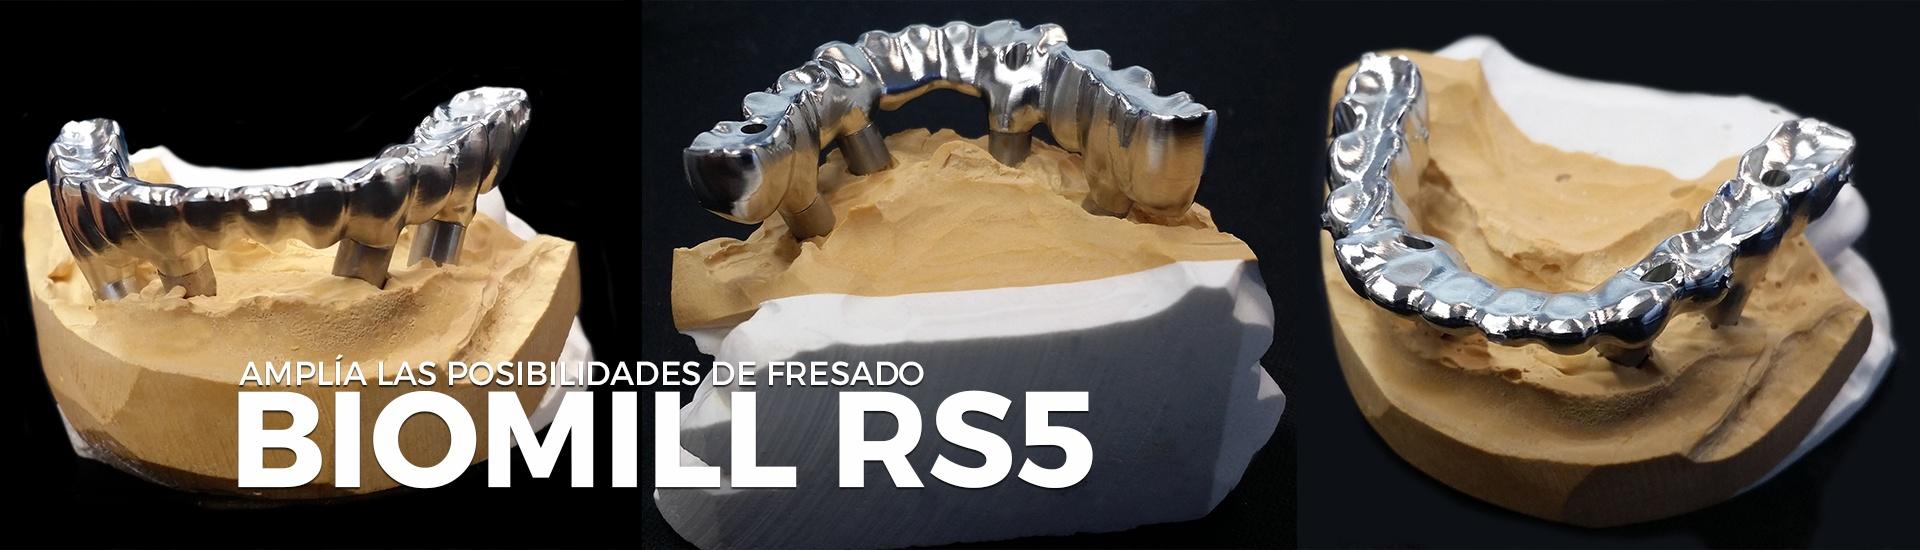 RS5_6